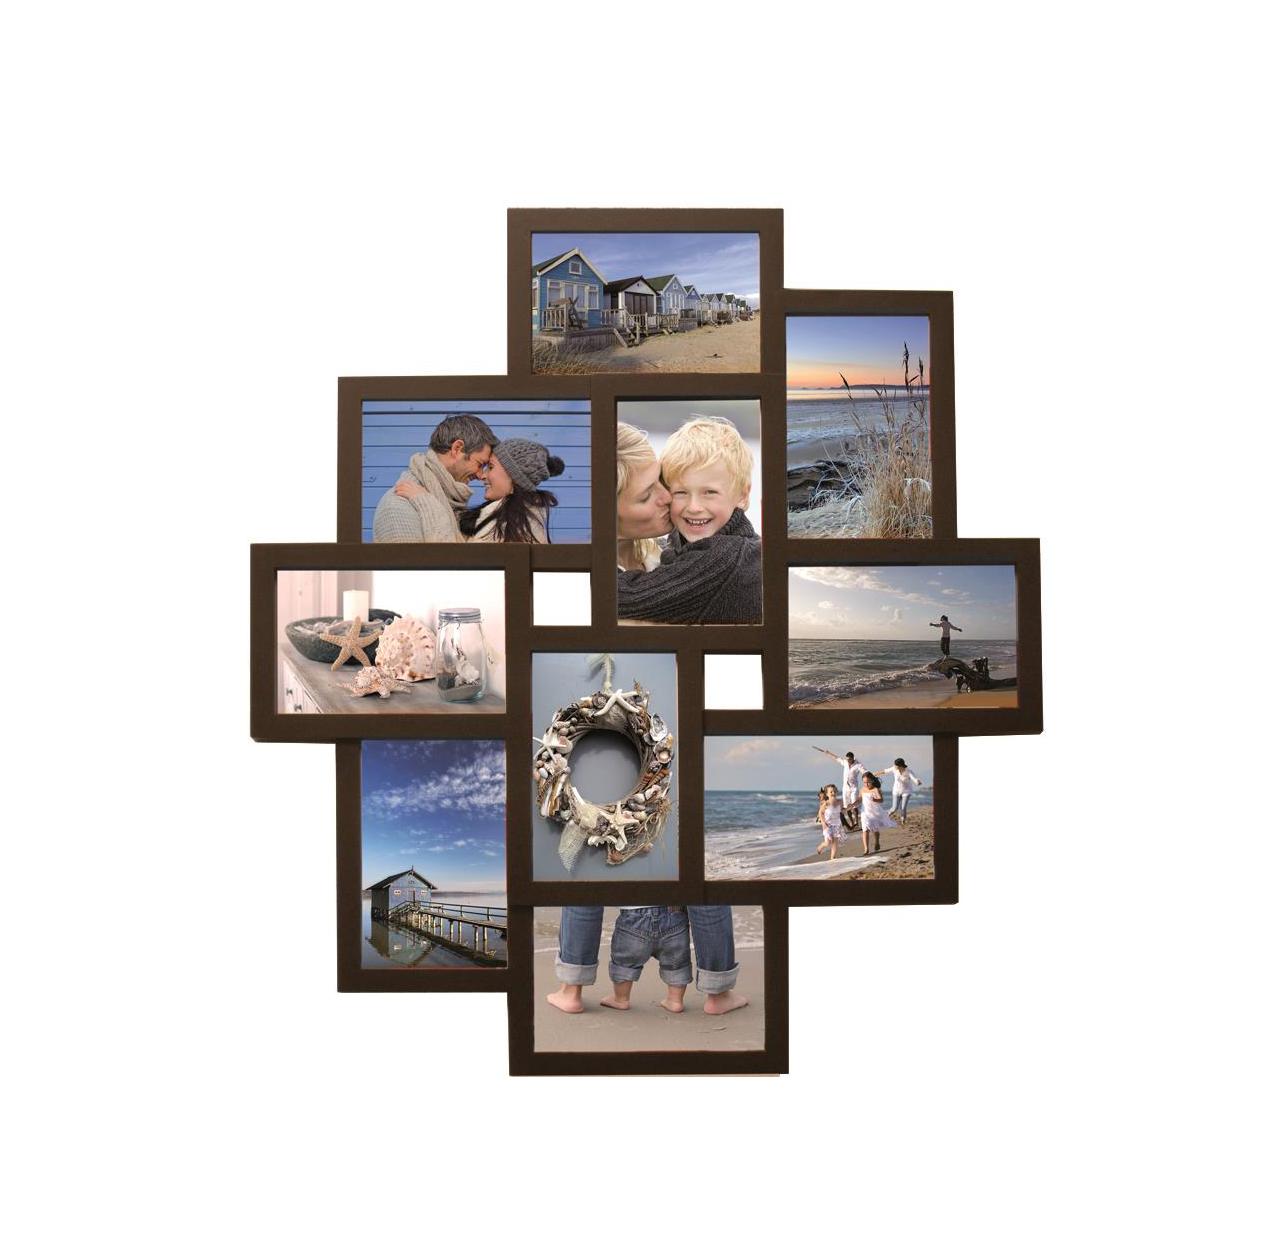 Henzo Holiday Brown Gallery 10 Photos 6x15x10 4x10x15 8121304 Κορνίζα Τοίχου